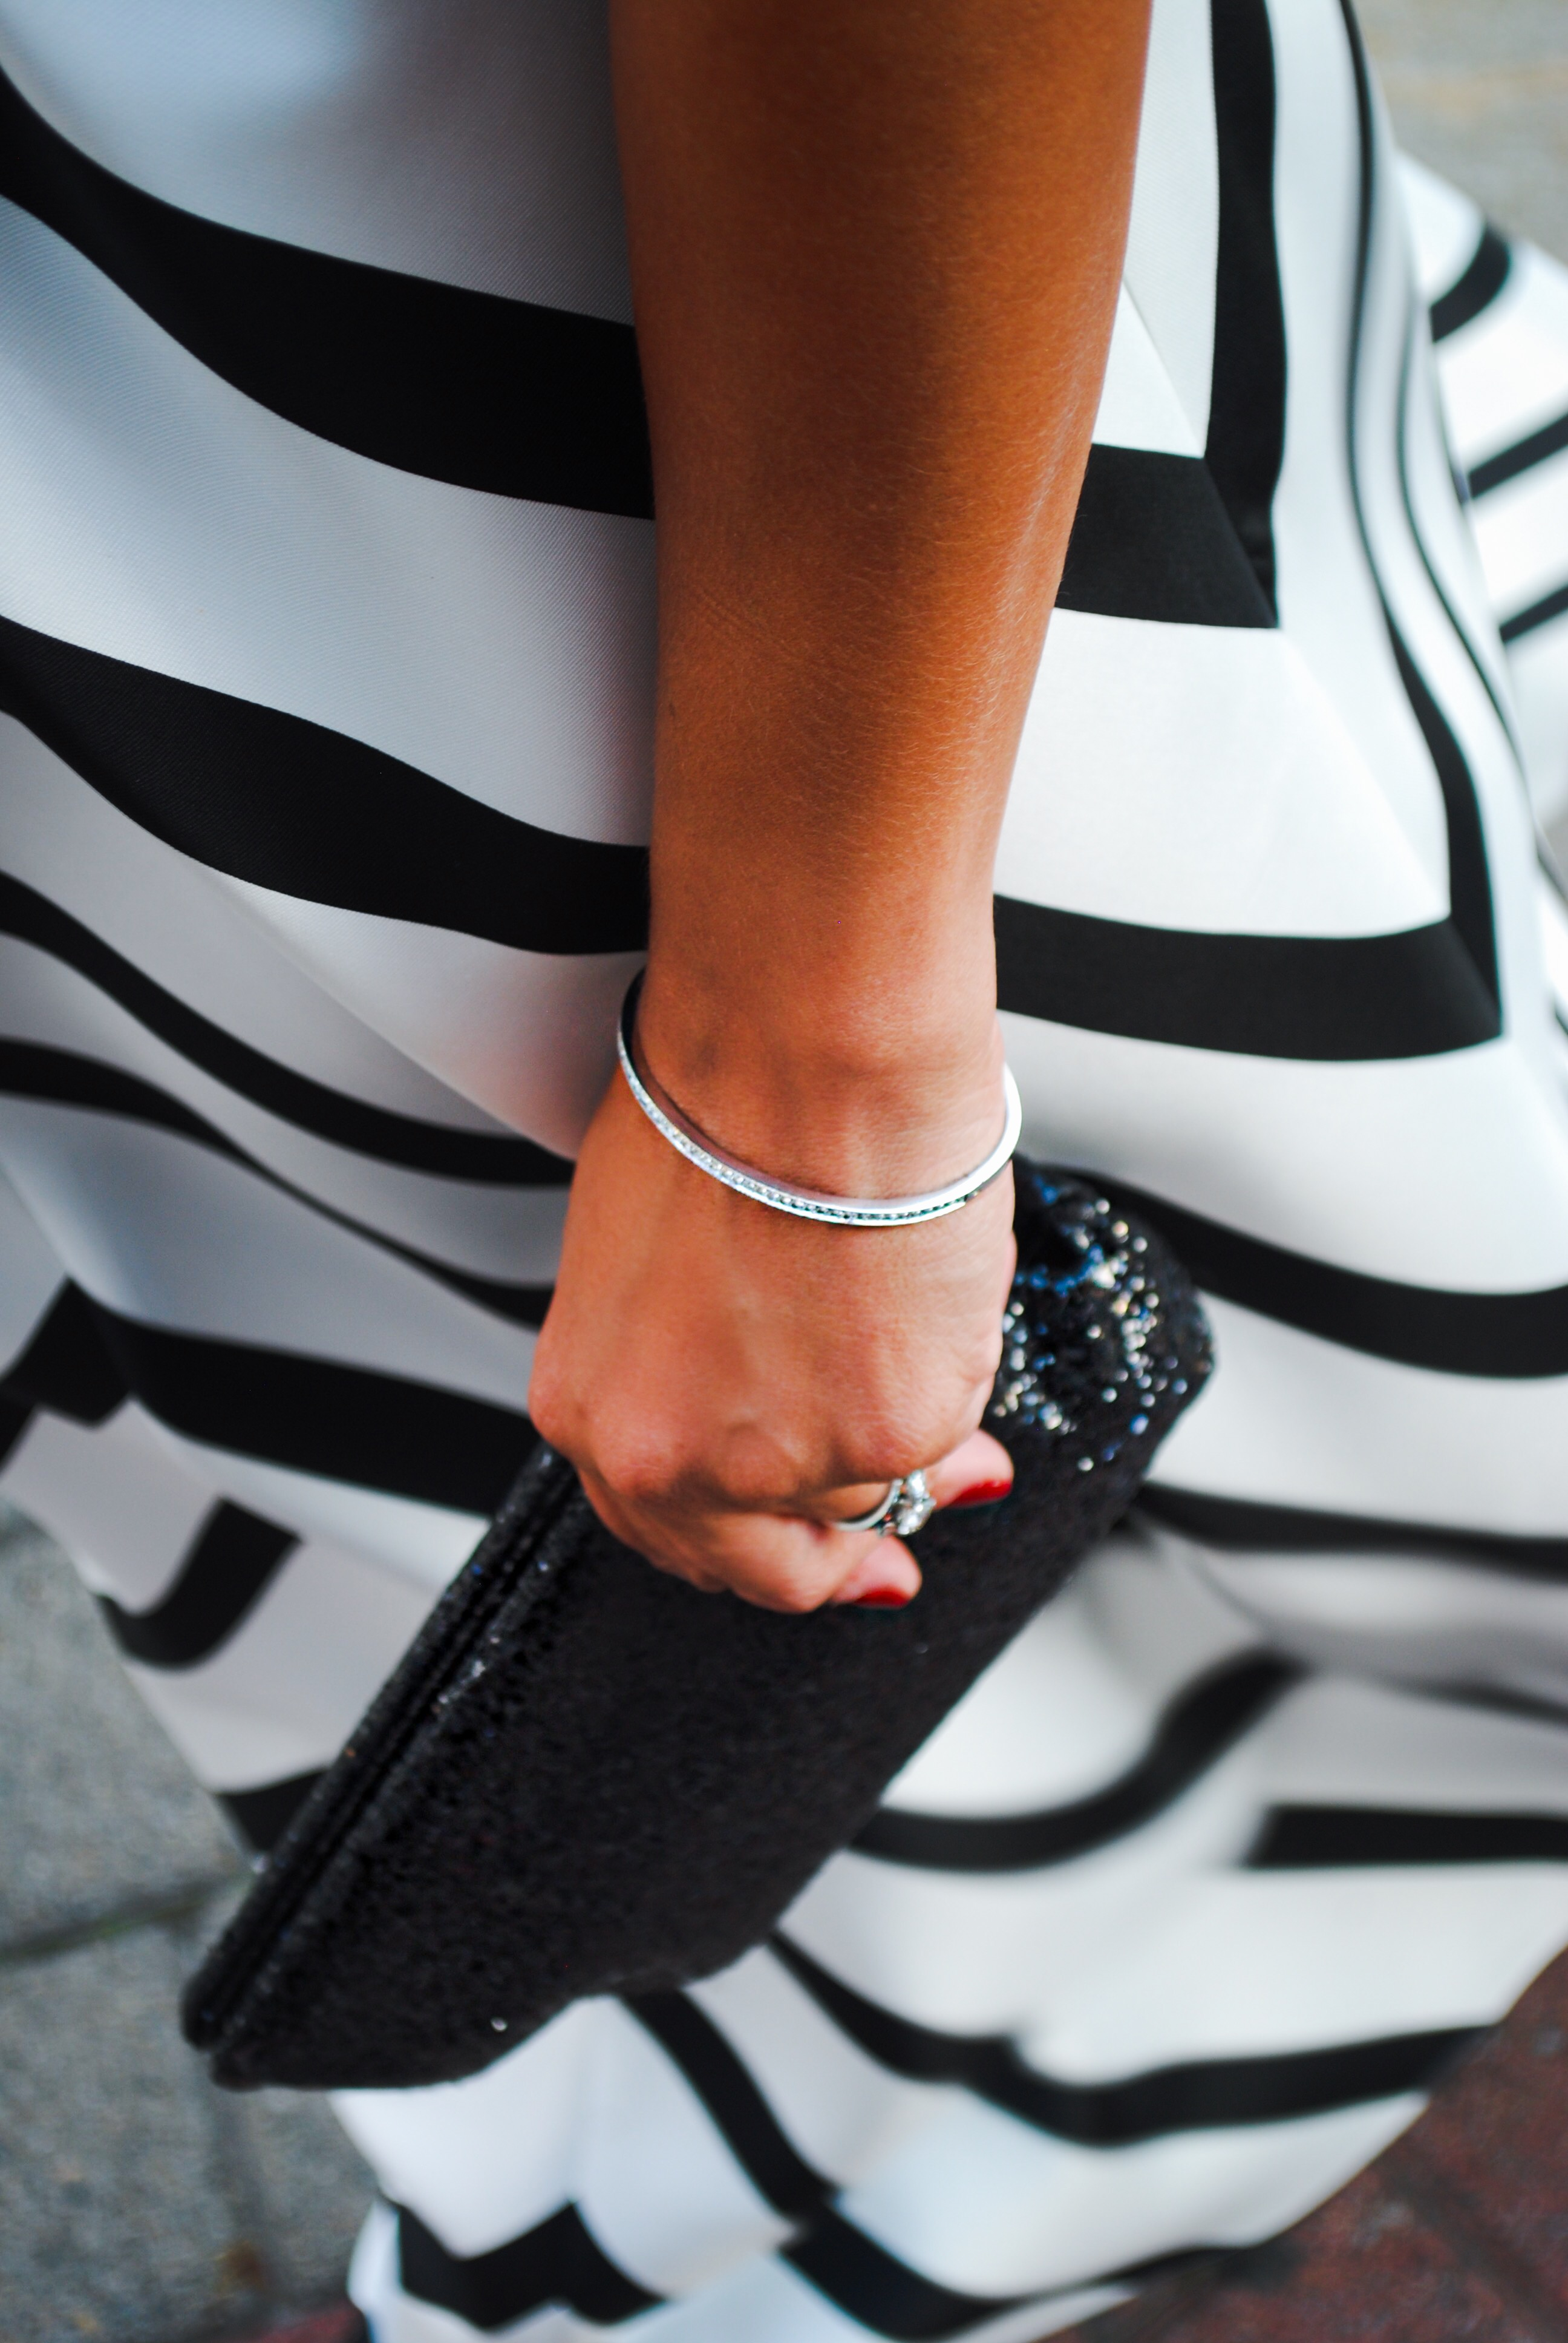 This Season's Gold // Moments - Tacori bracelet